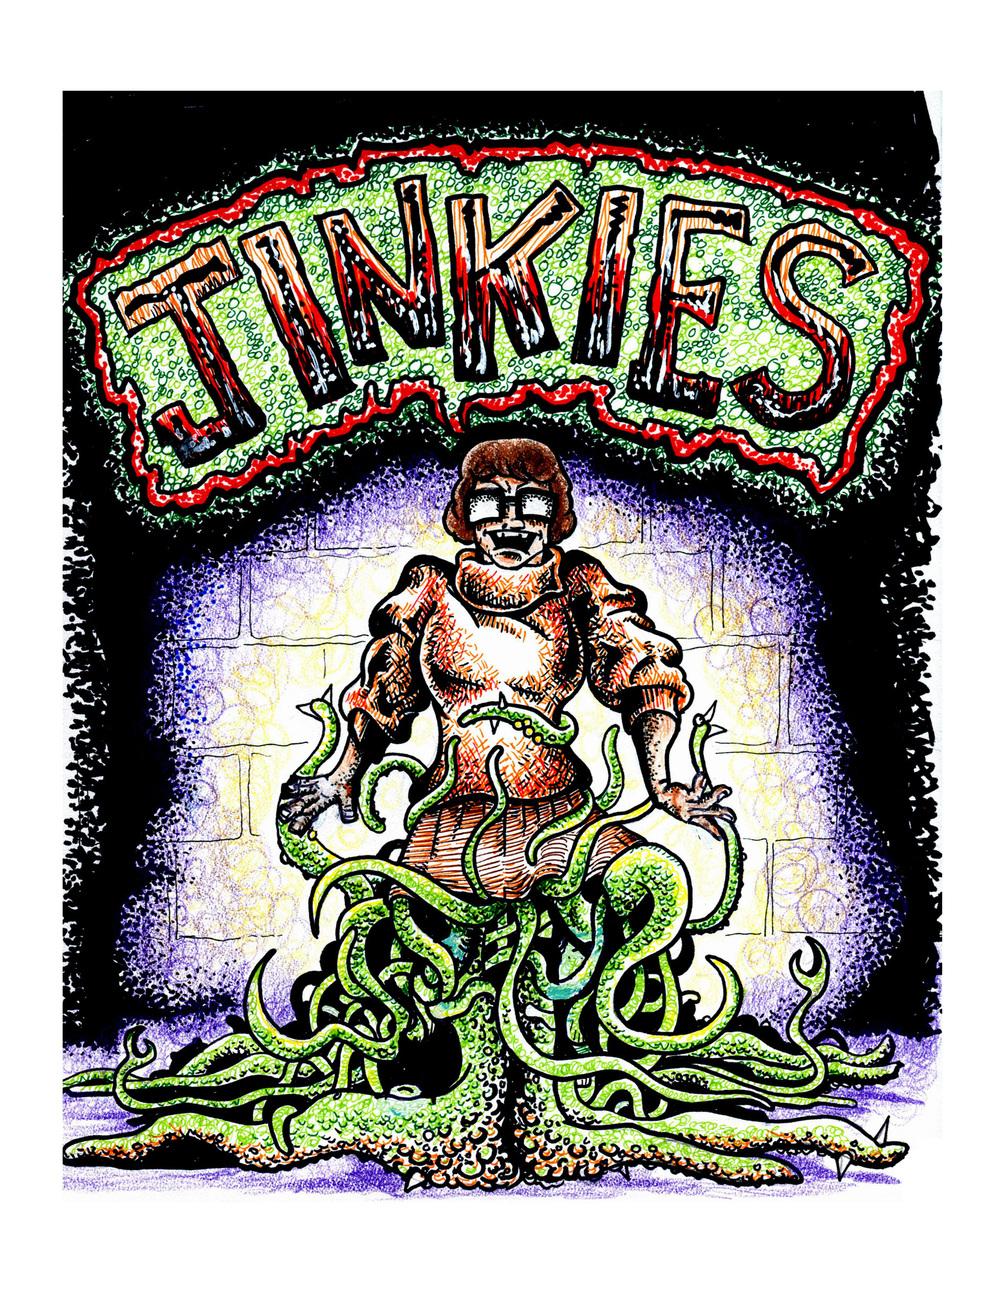 Jinkies8.5x11.jpg